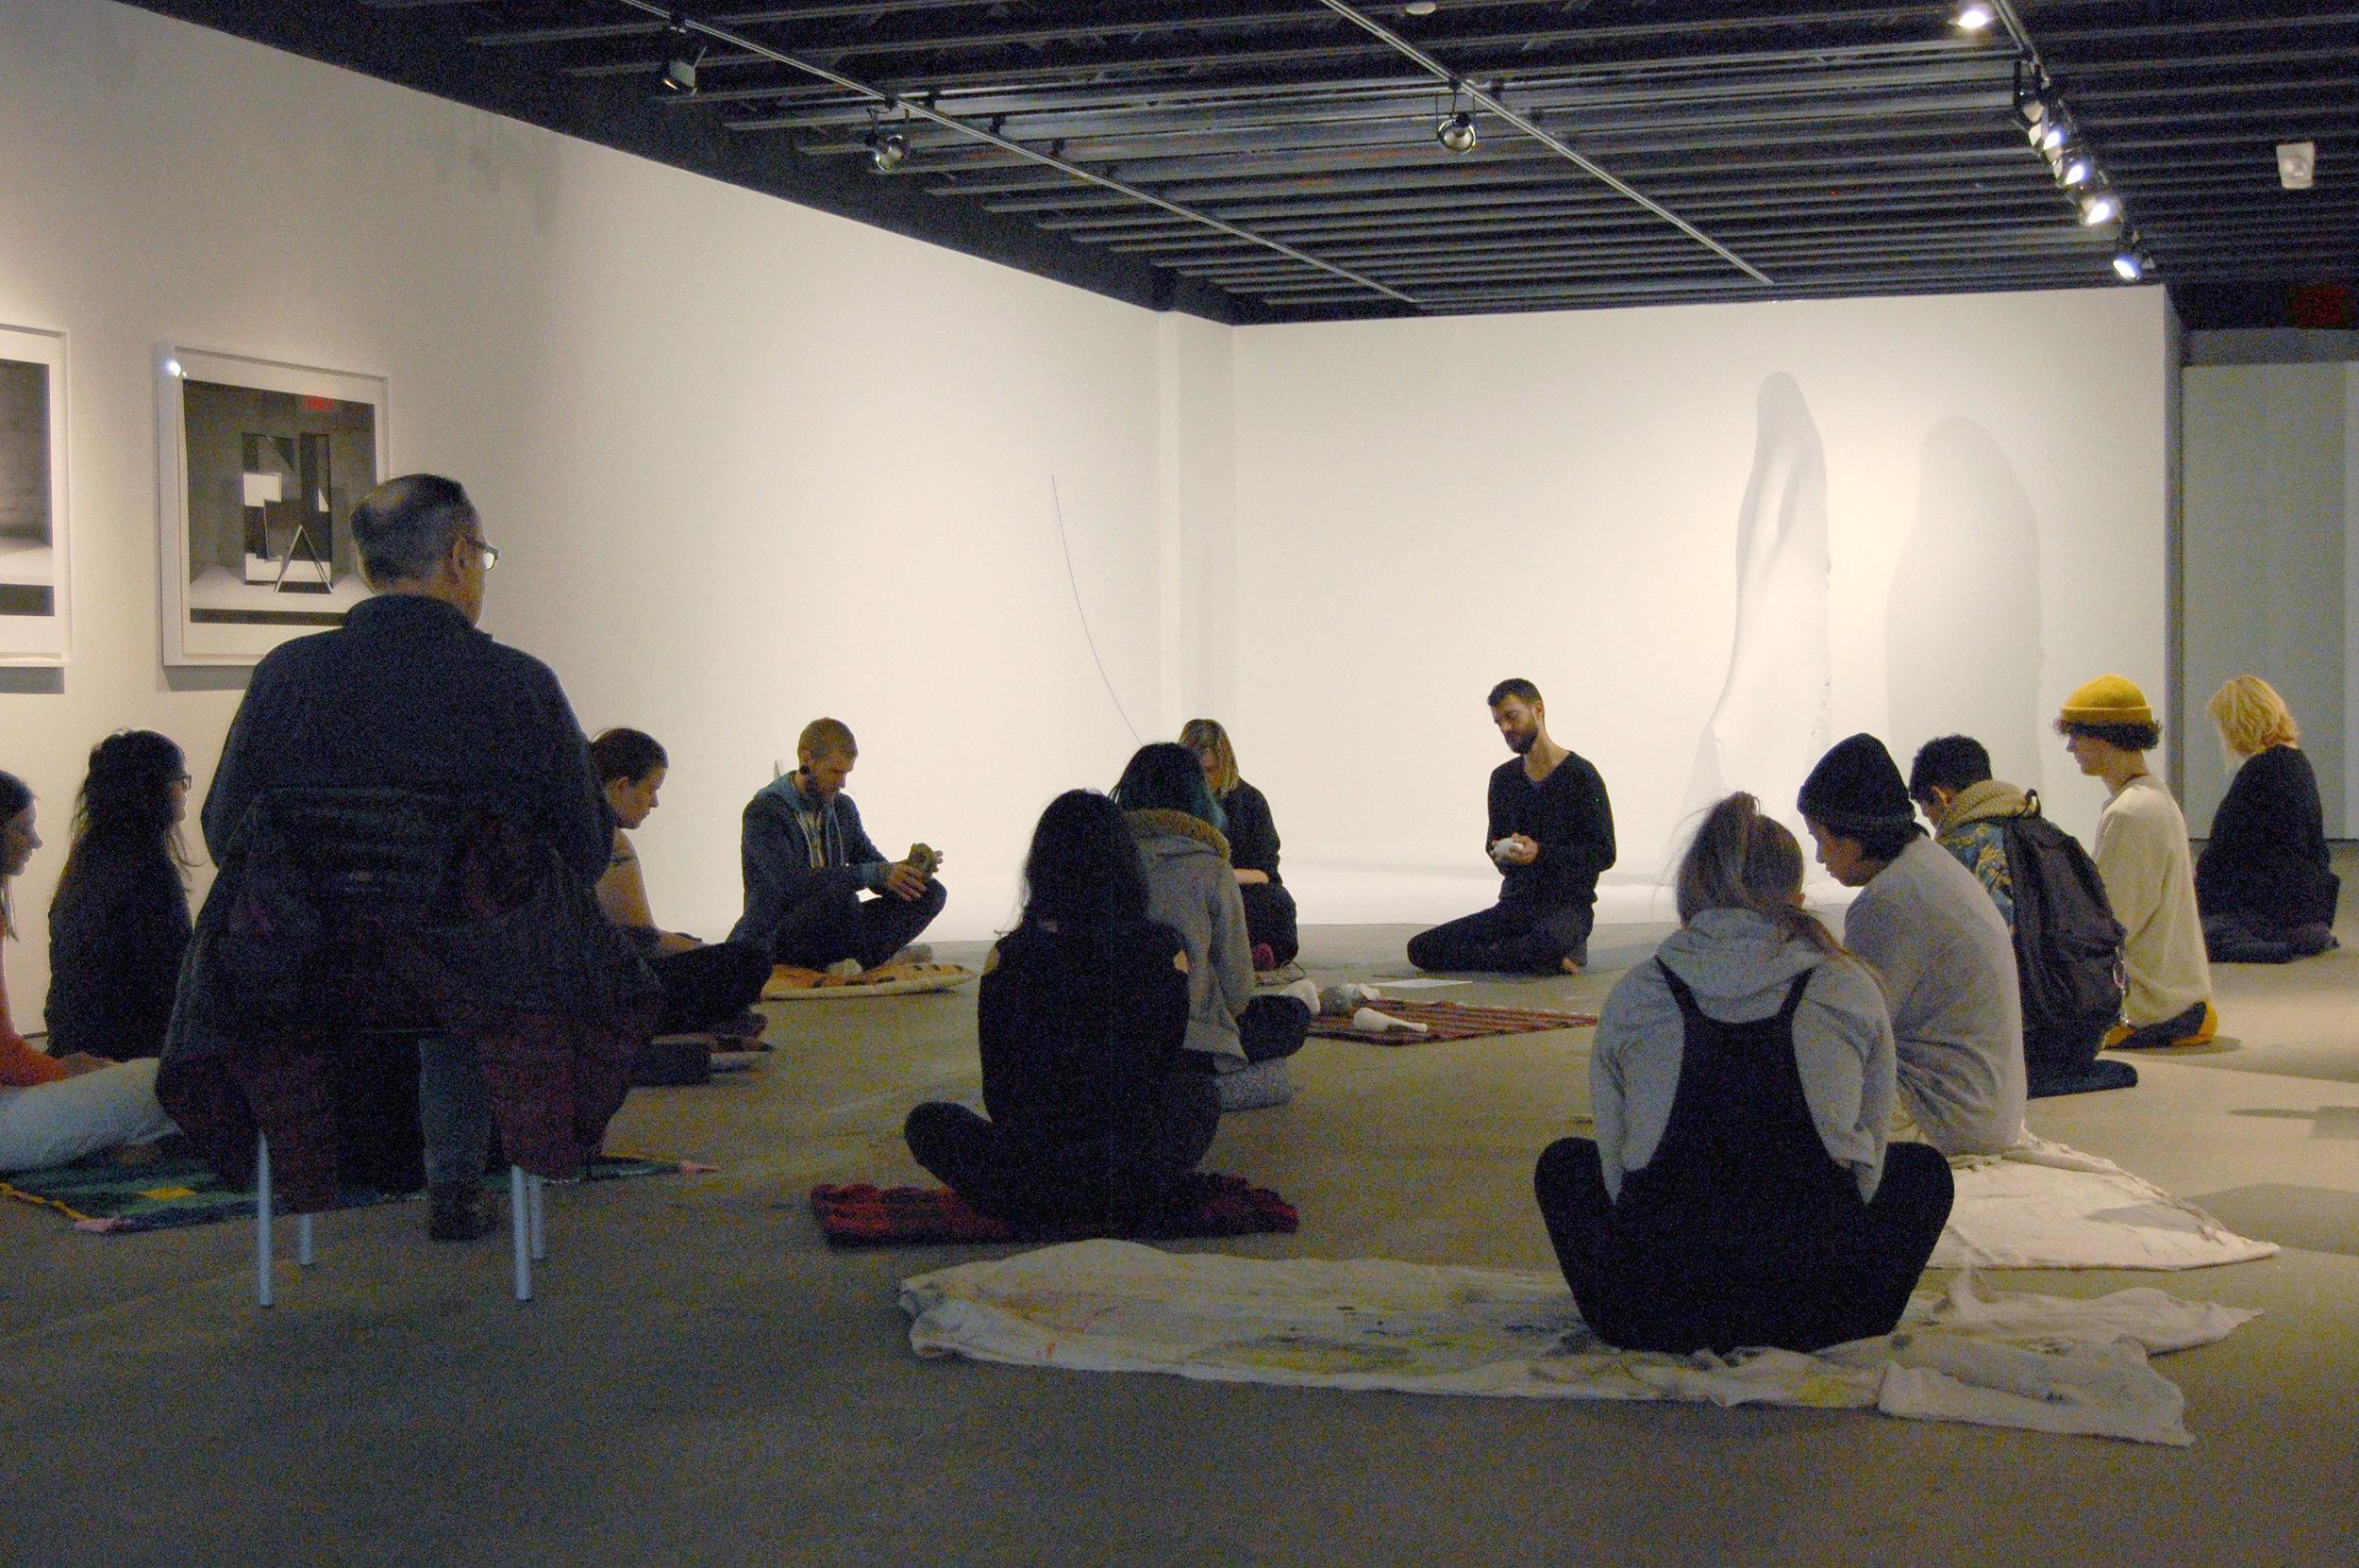 Meditation for  Casting Shadows: 2017 Kansas City Art Institute Biennial , H&R Block Artspace, Nov 2017